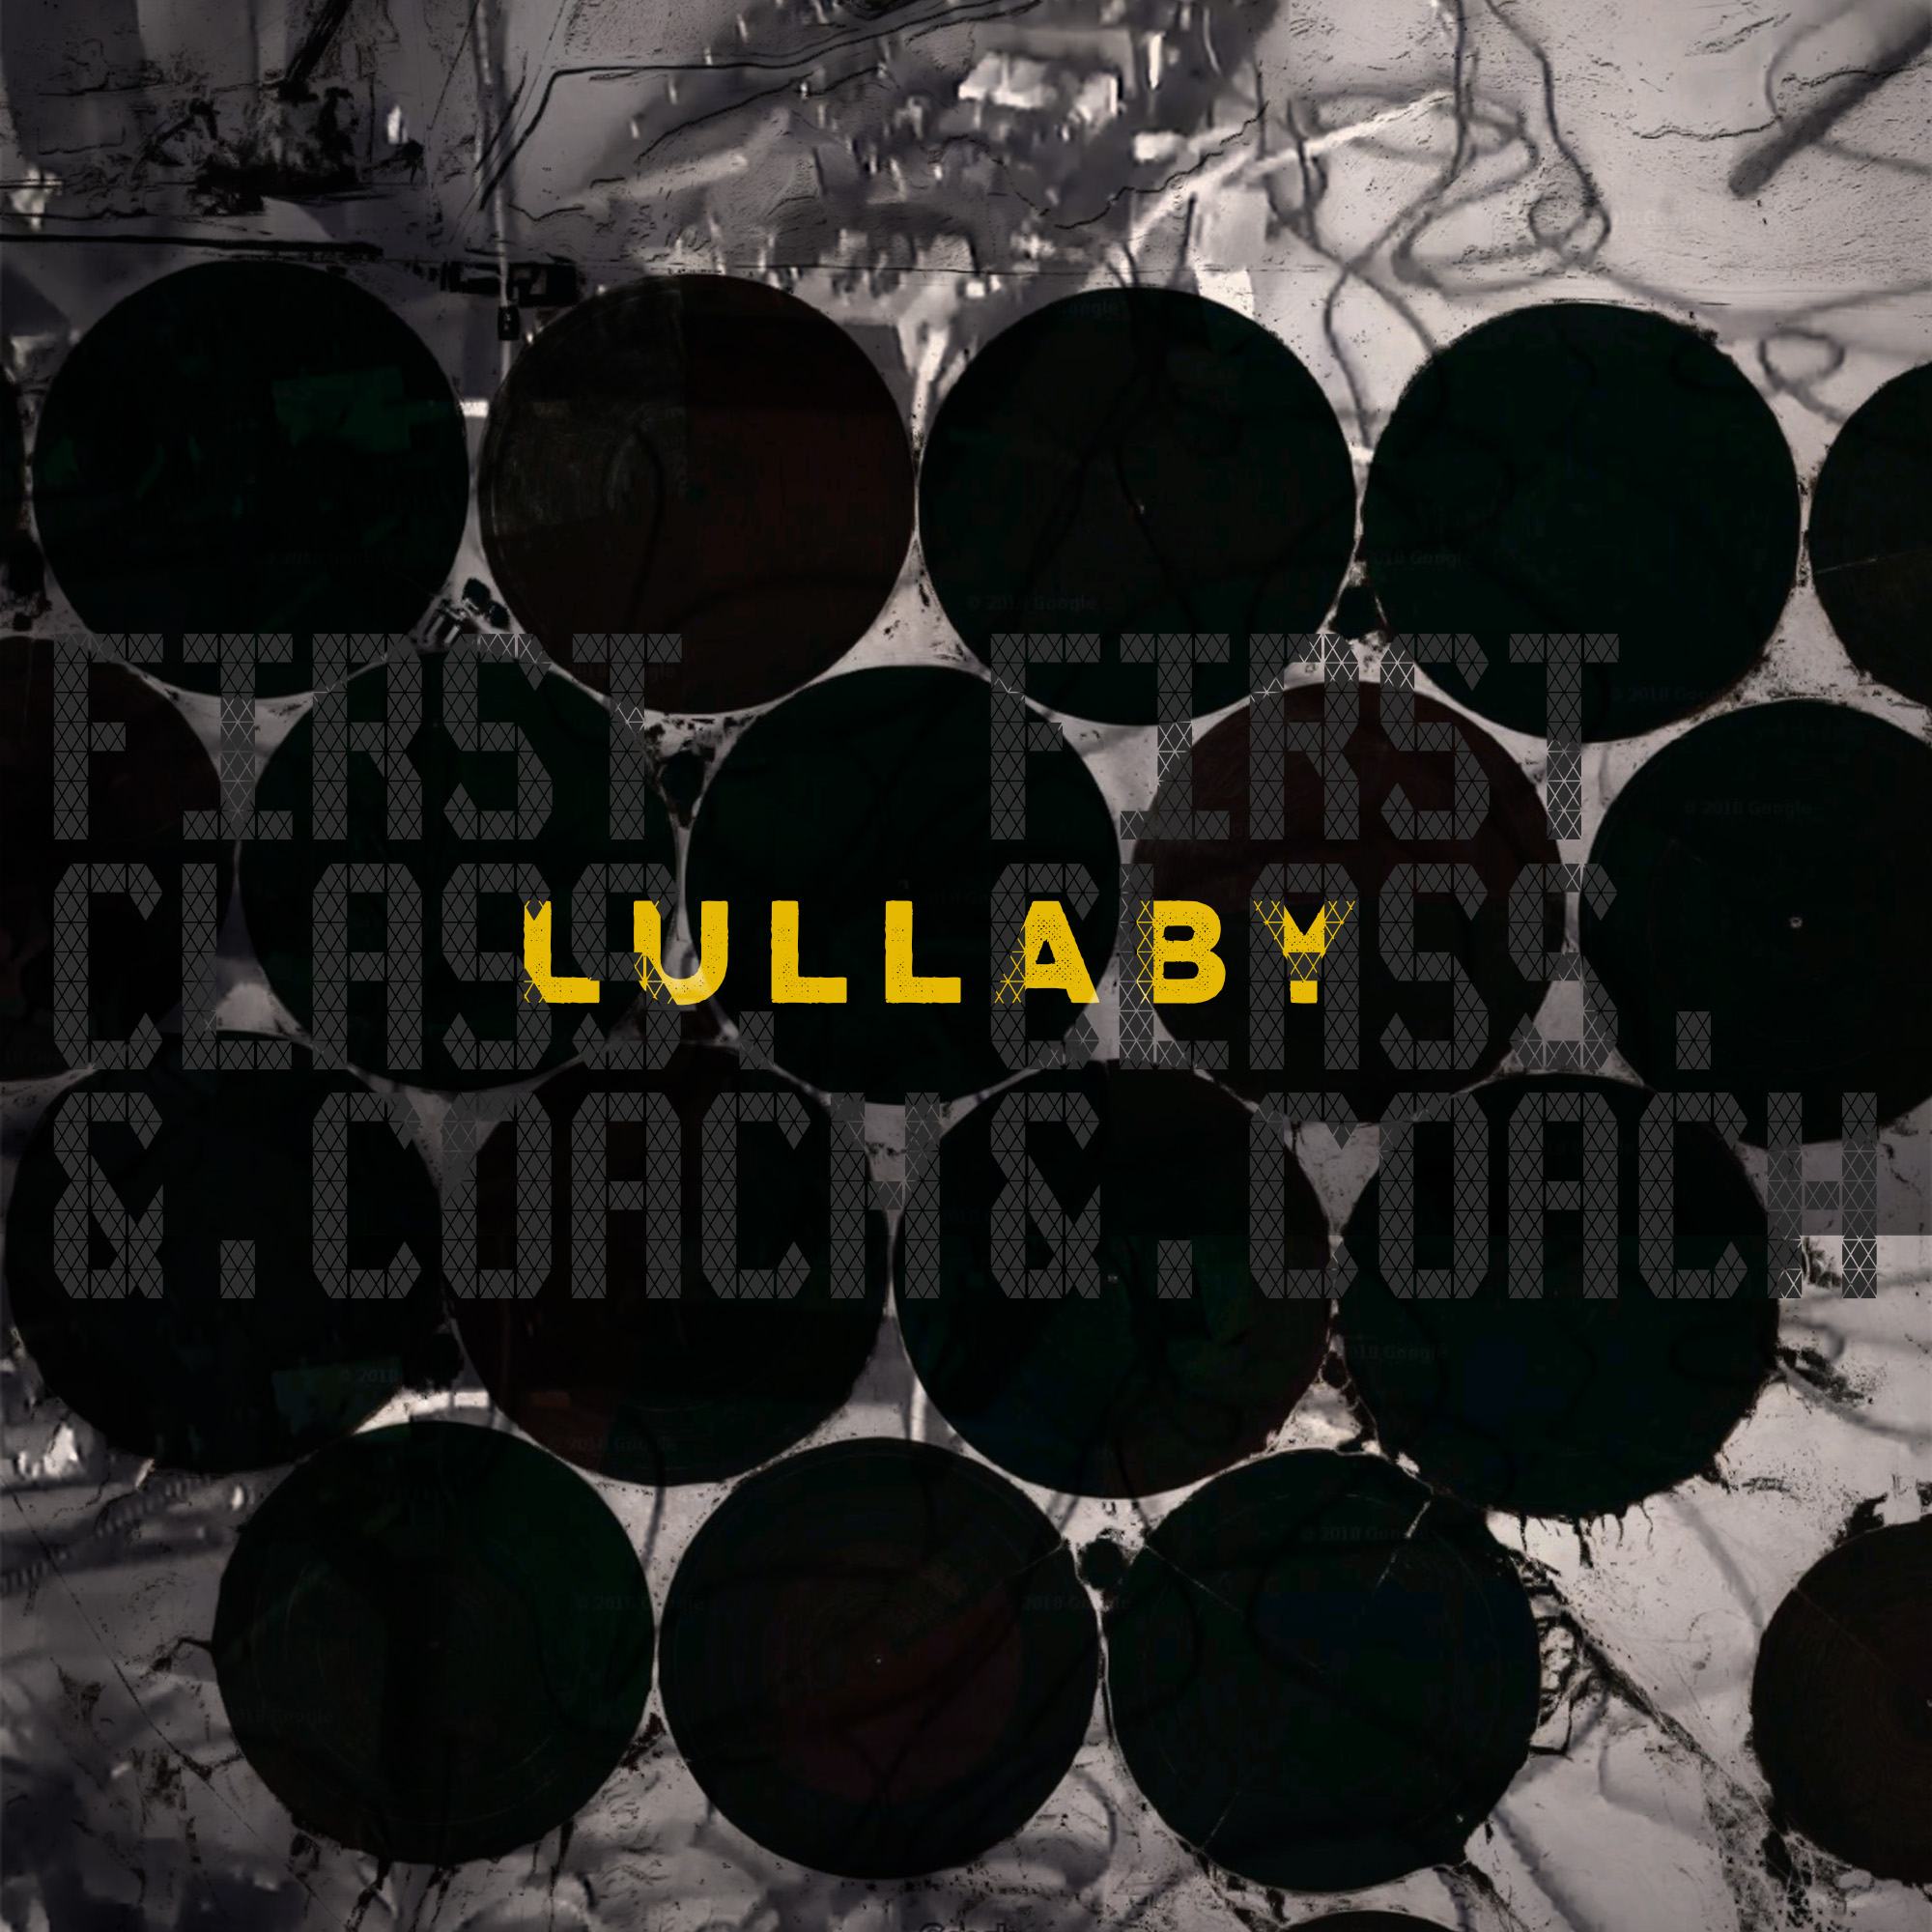 lullaby_image.jpg